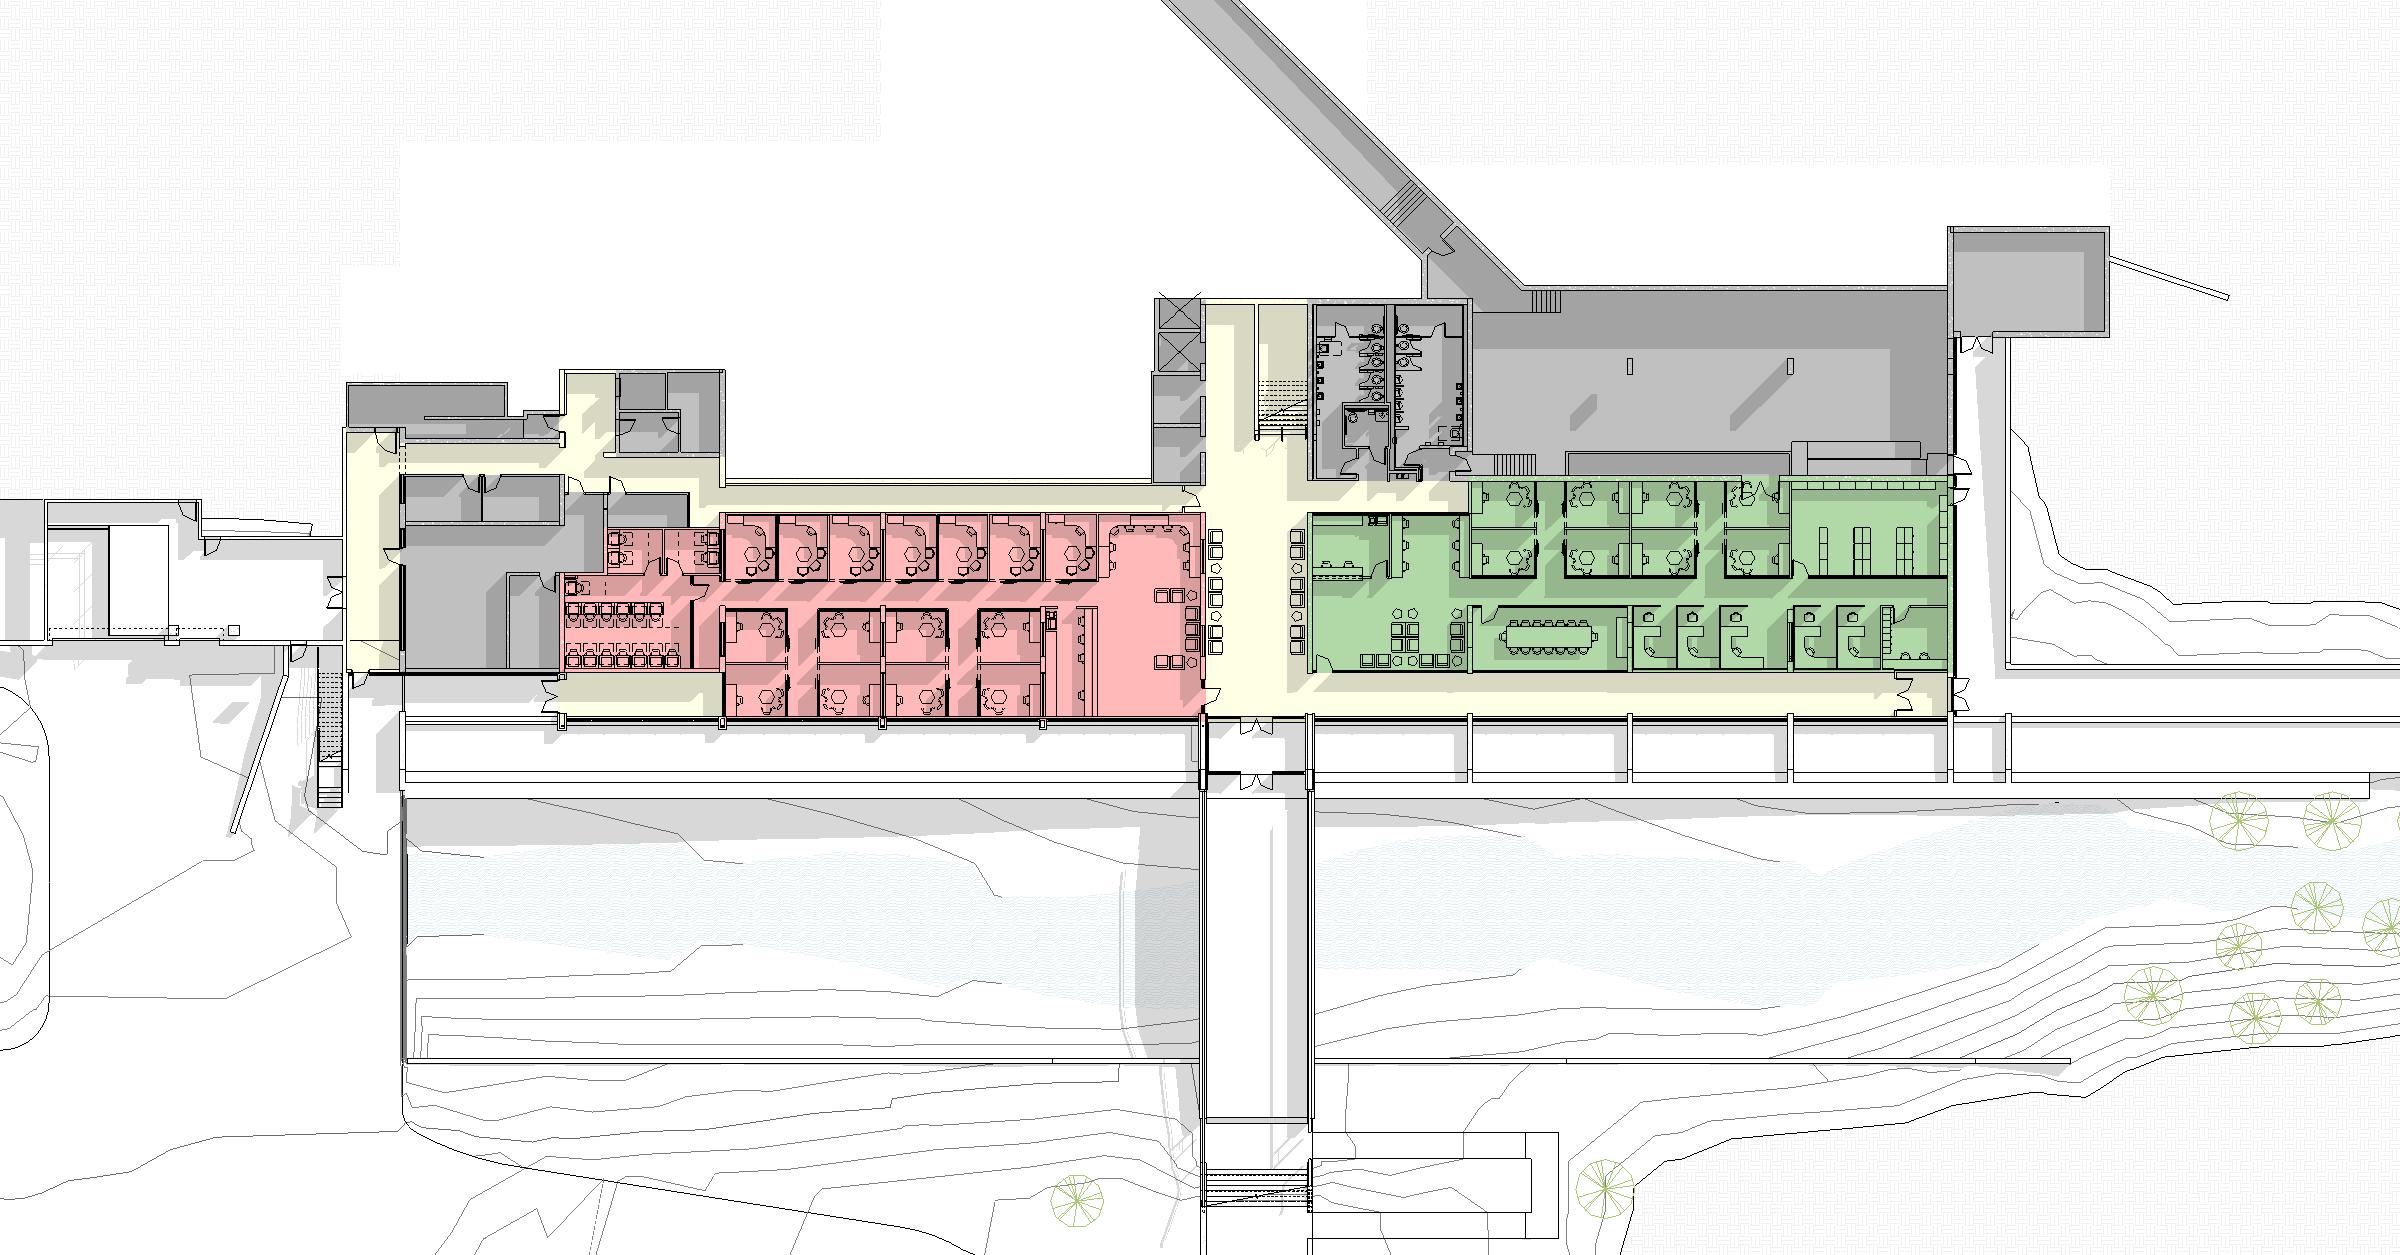 HCC_Level1.png